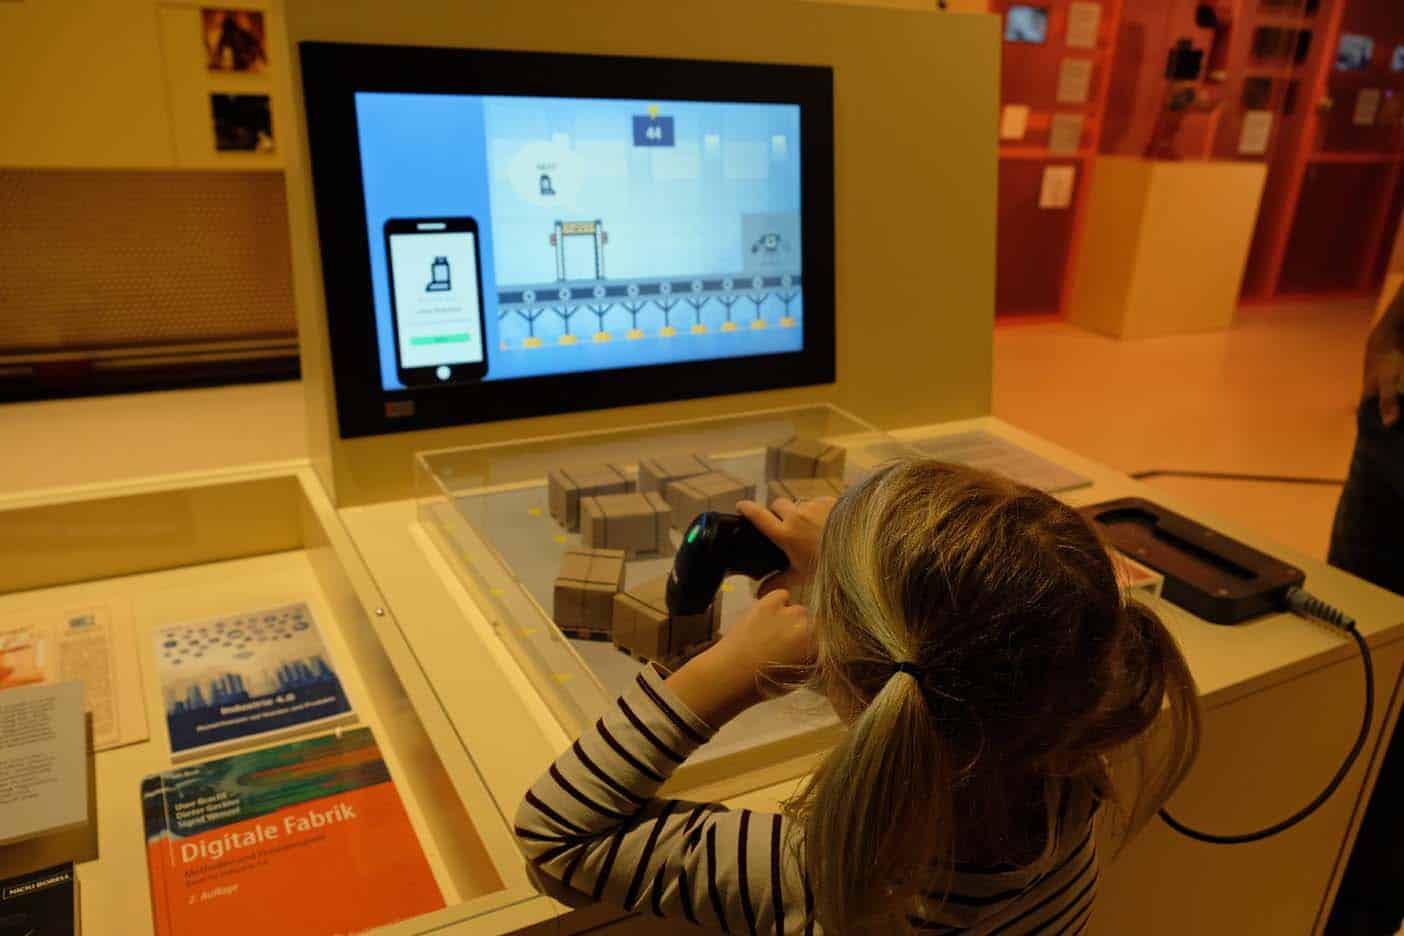 technologiemuseum